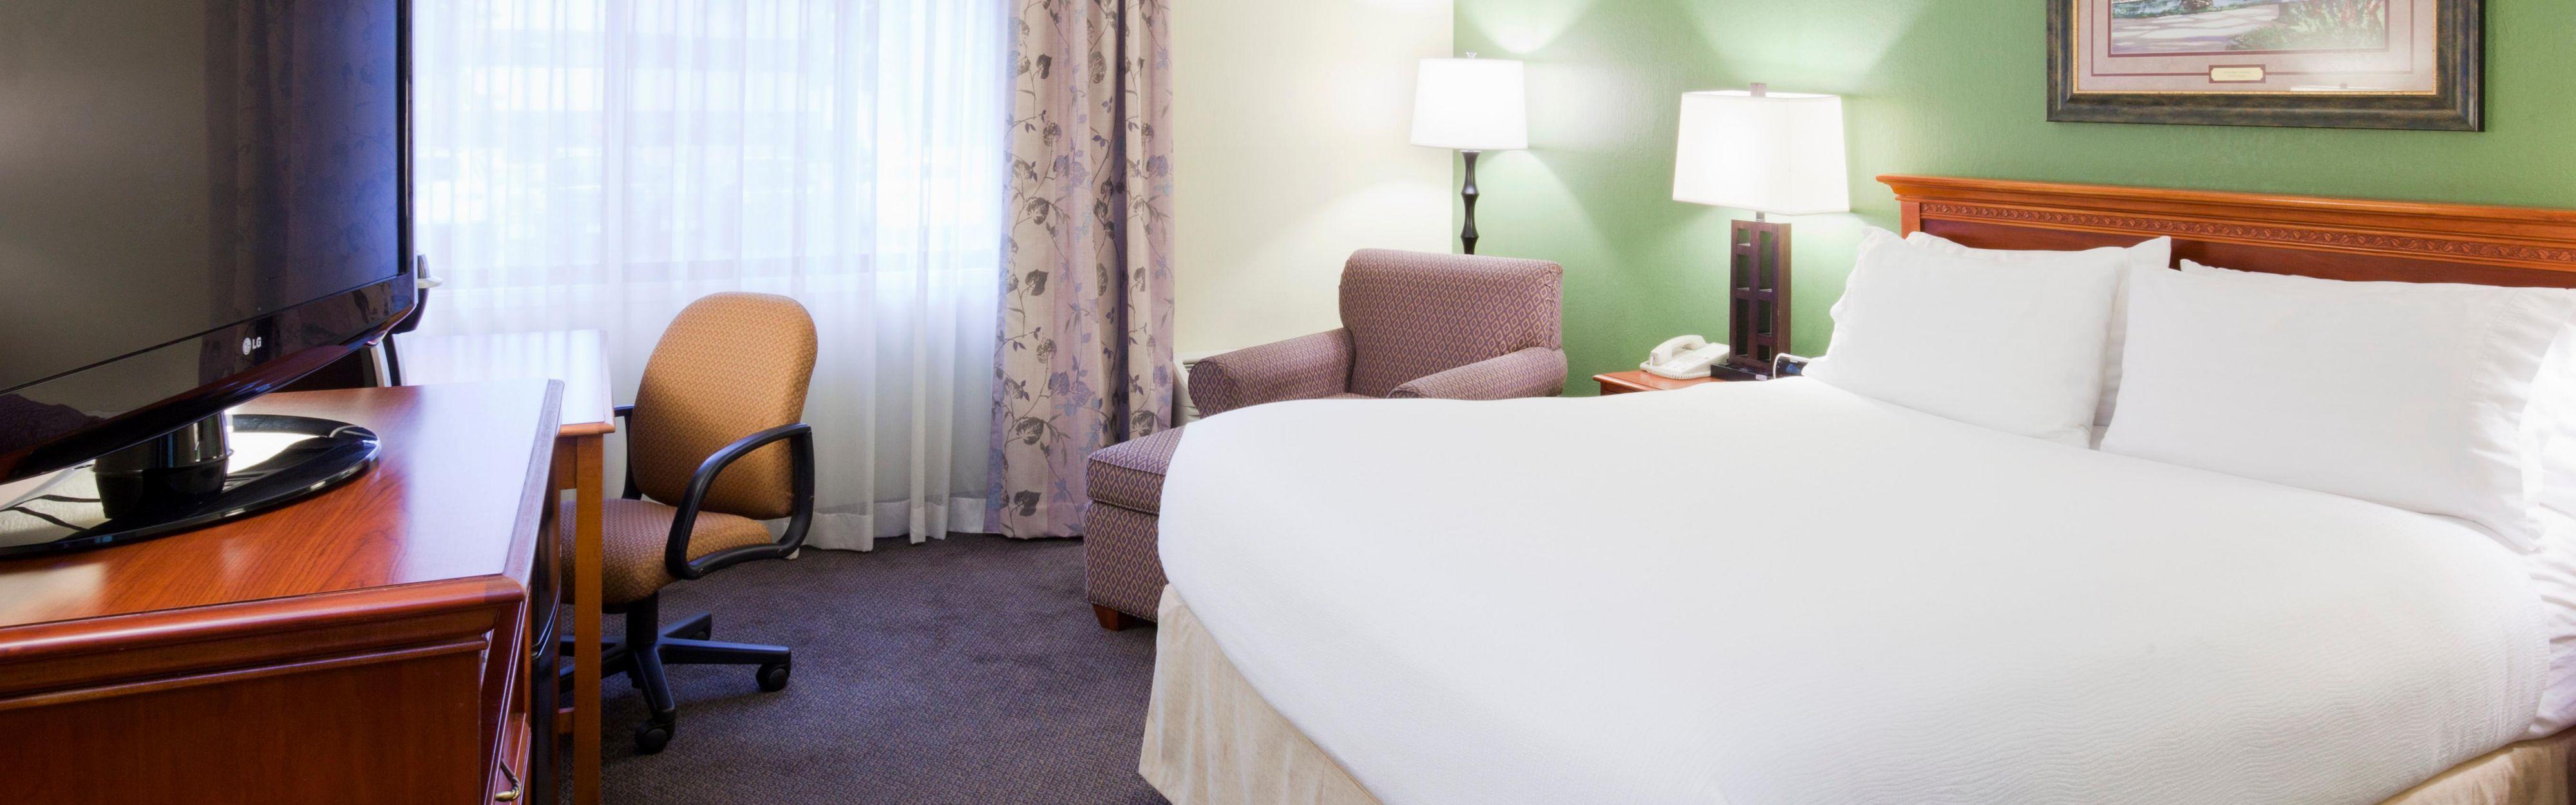 Holiday Inn St. Cloud image 1